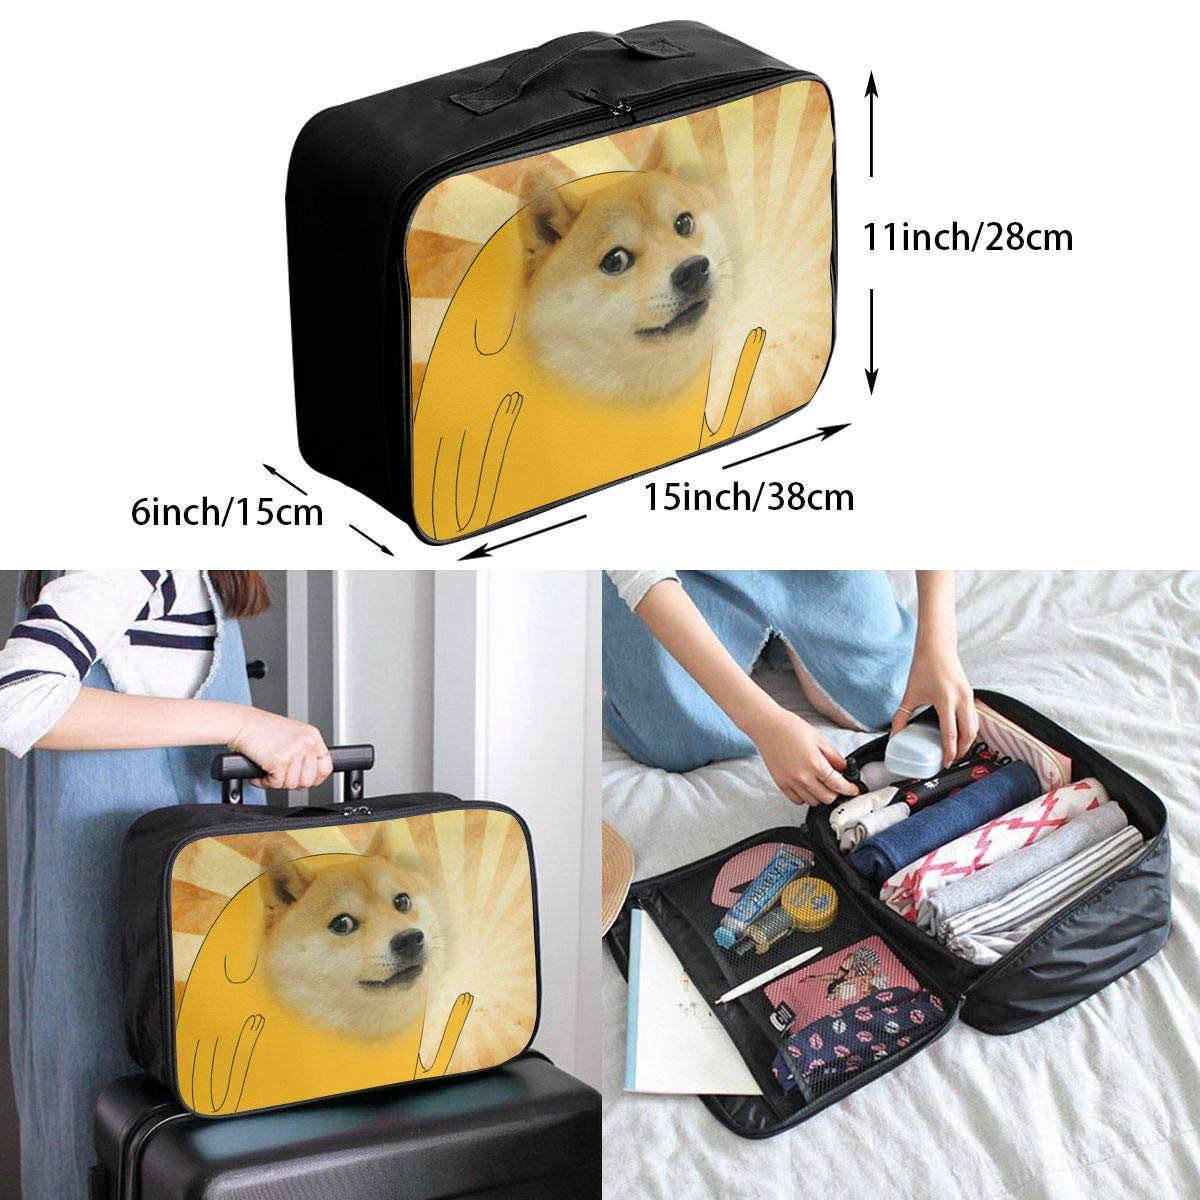 Lightweight Large Capacity Portable Duffel Bag for Men /& Women Sausage Doge Travel Duffel Bag Backpack JTRVW Luggage Bags for Travel